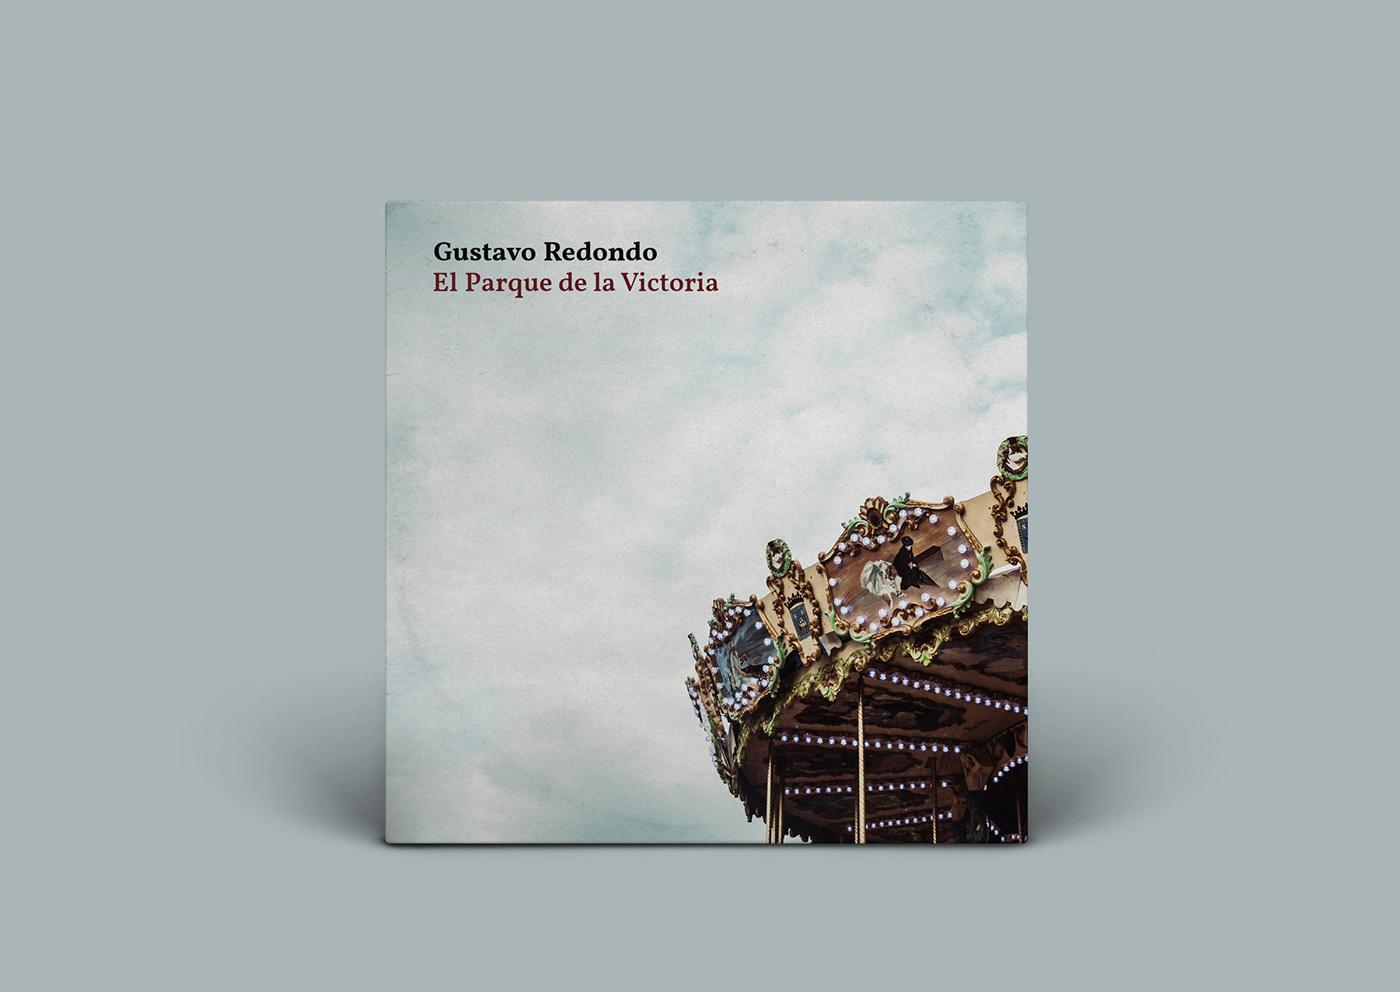 Album albumcover artwork cover design Fotografia minimal music Photography  type